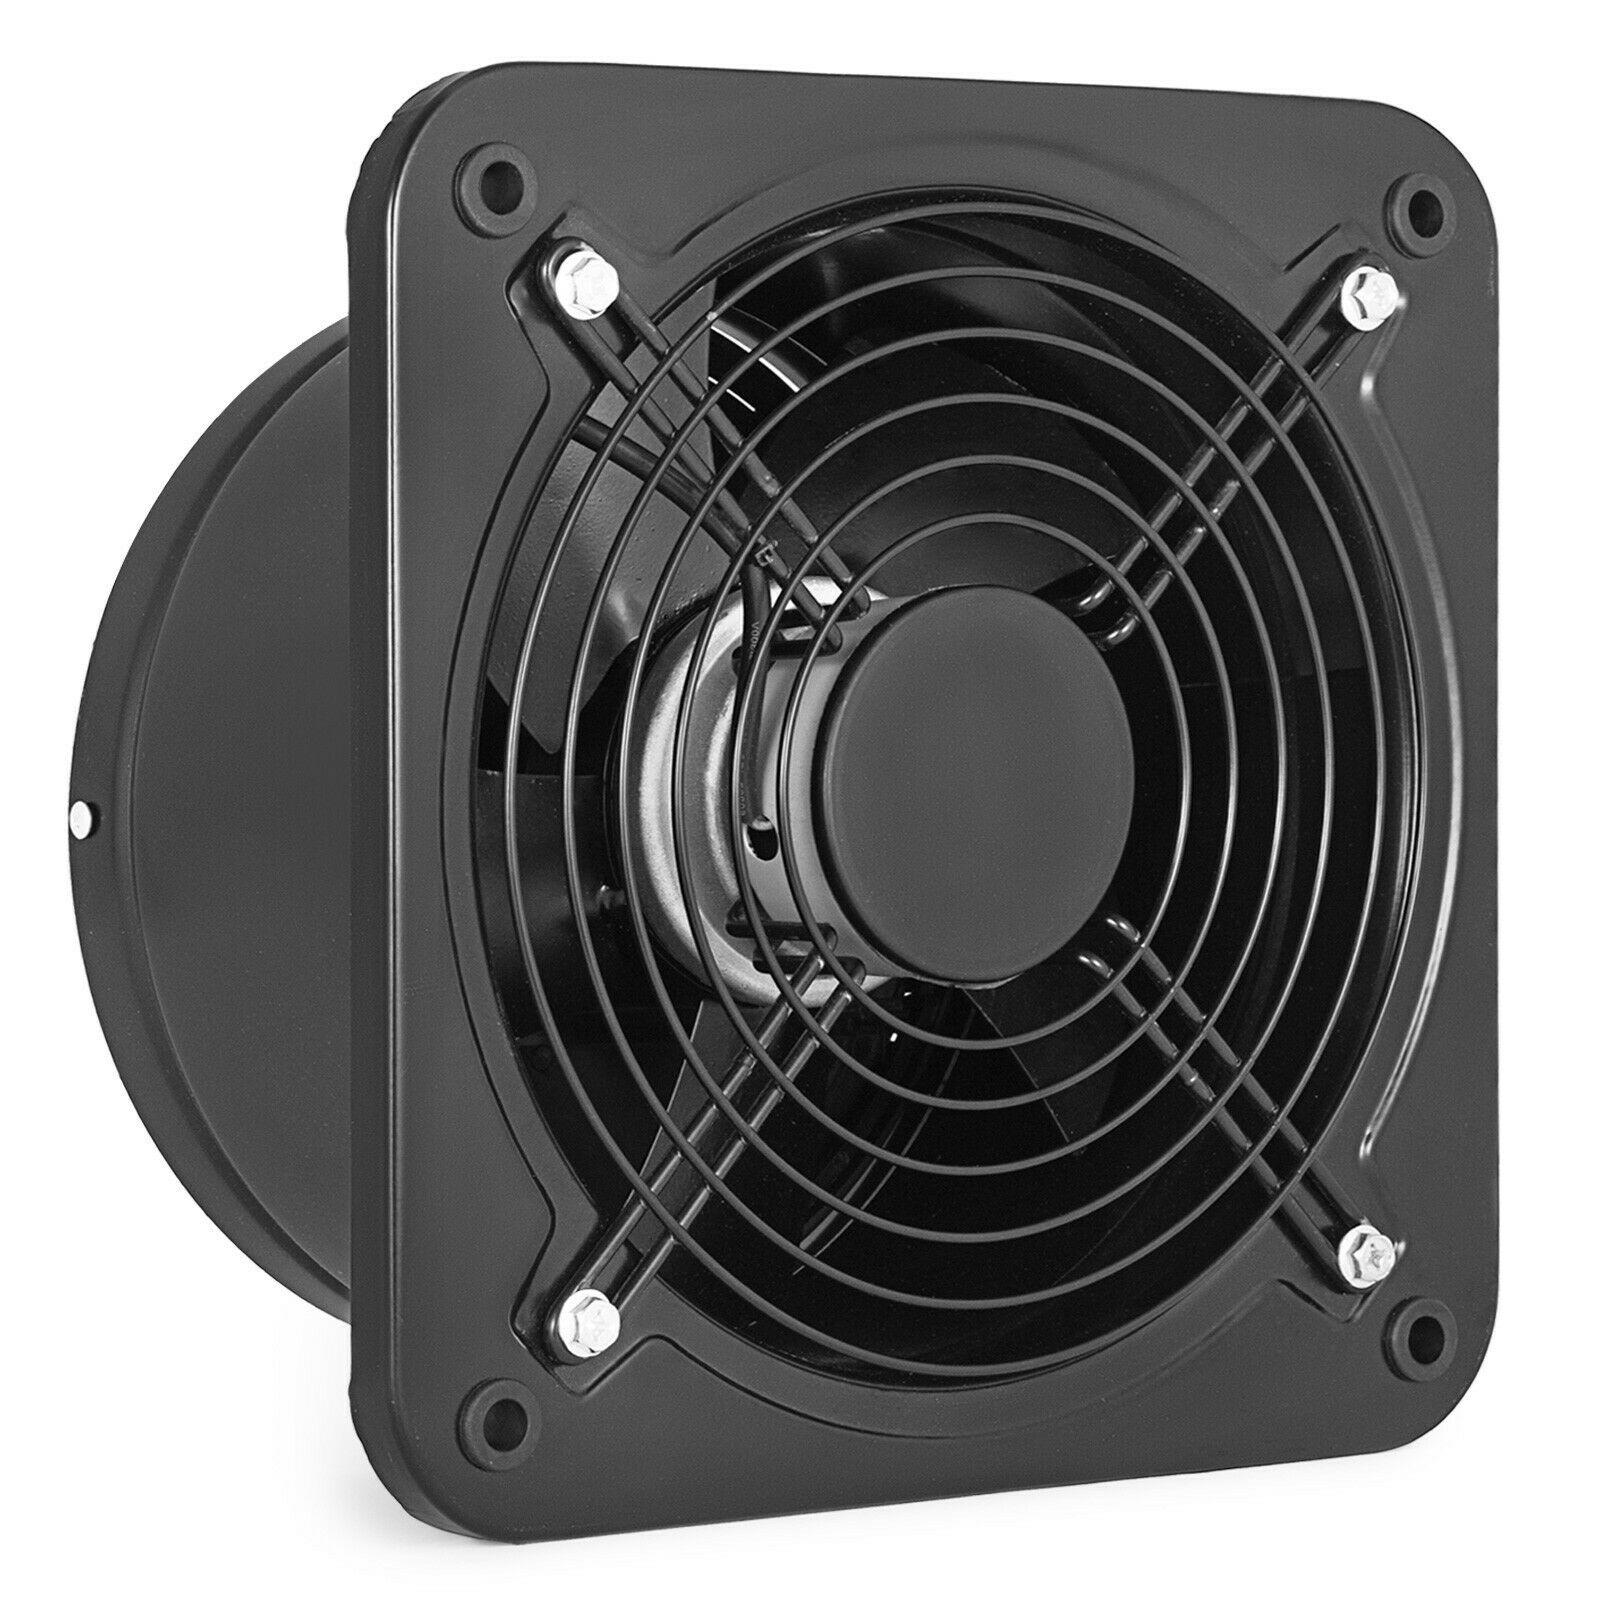 Industrial Ventilation Extractor Fan Metal Axial Exhaust Air 10 inch